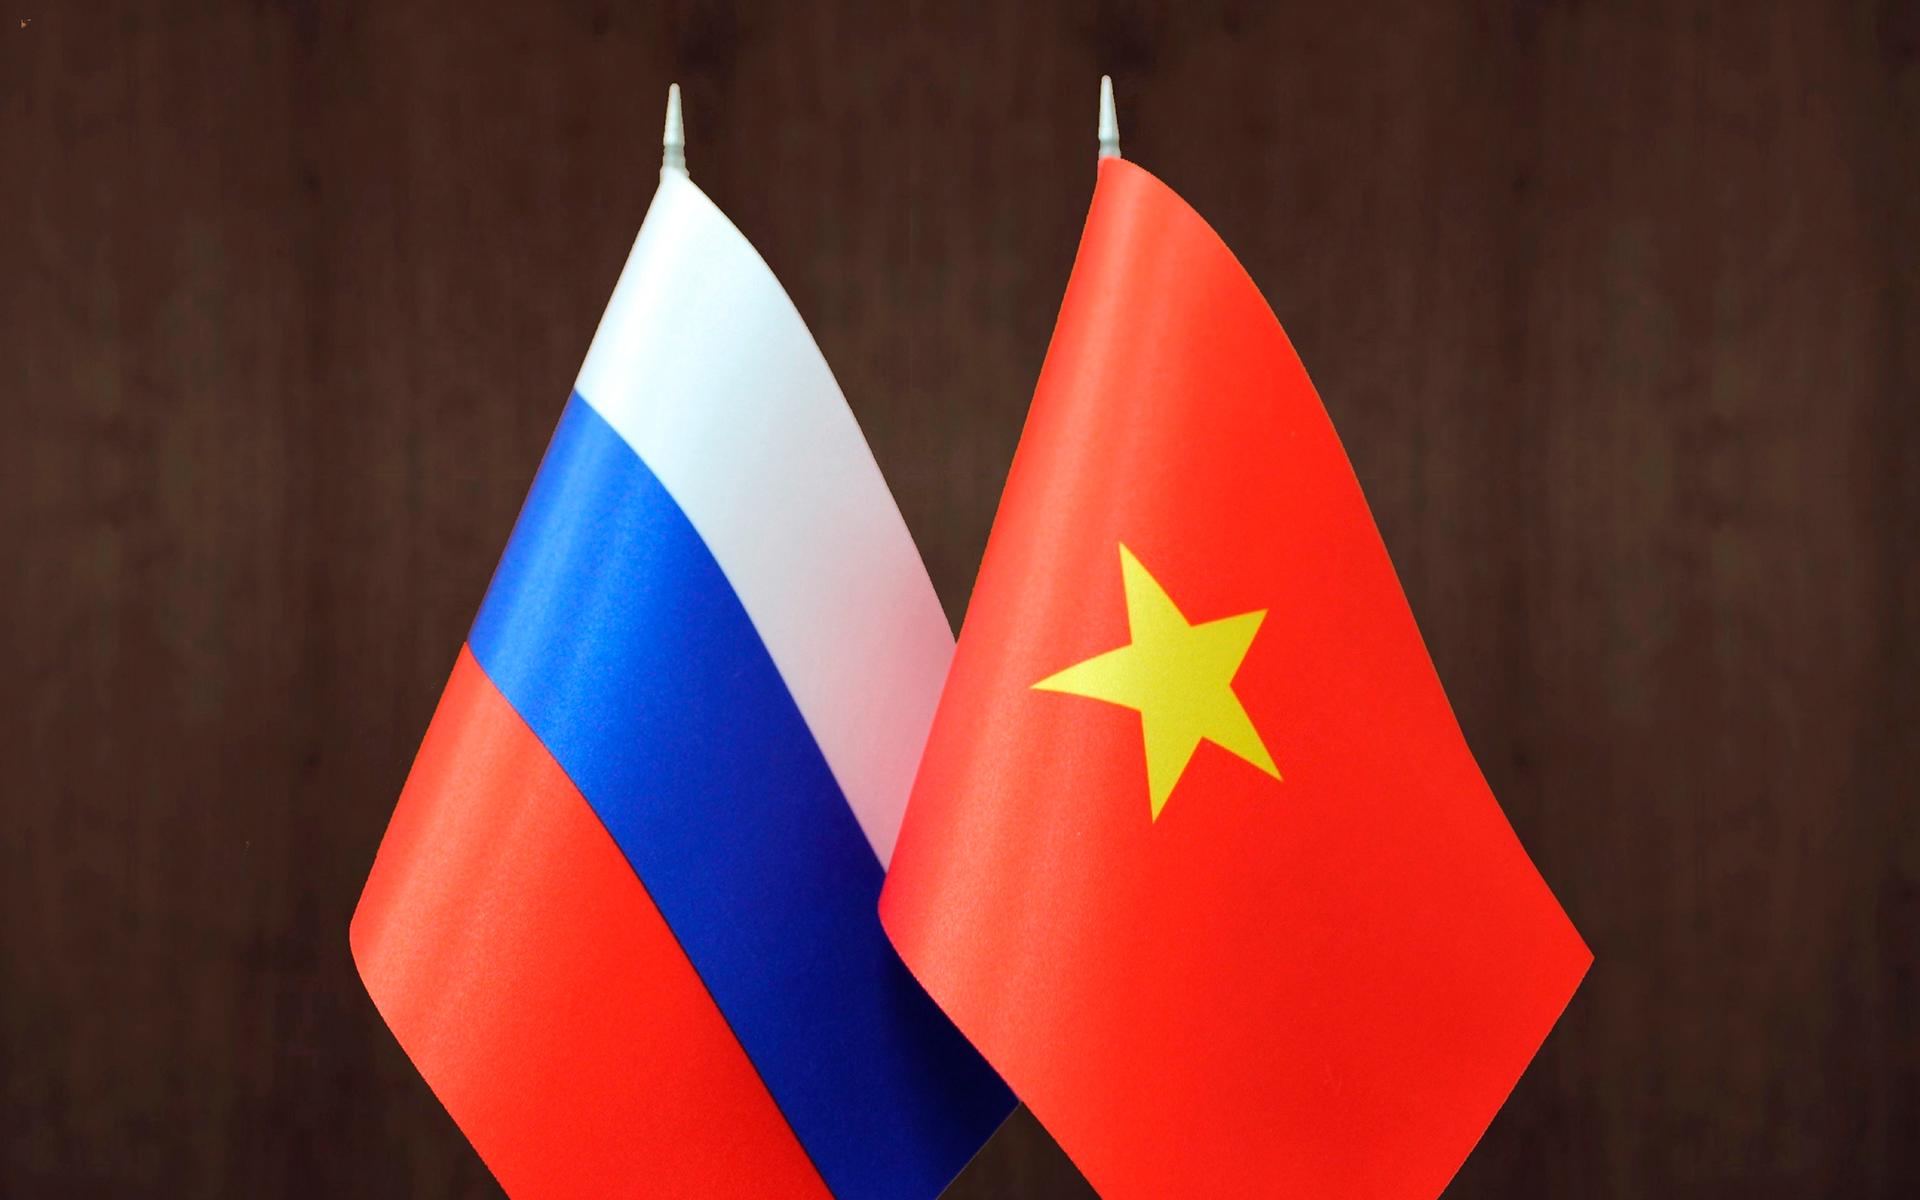 Сотрудничество России и Вьетнама в борьбе с COVID-19